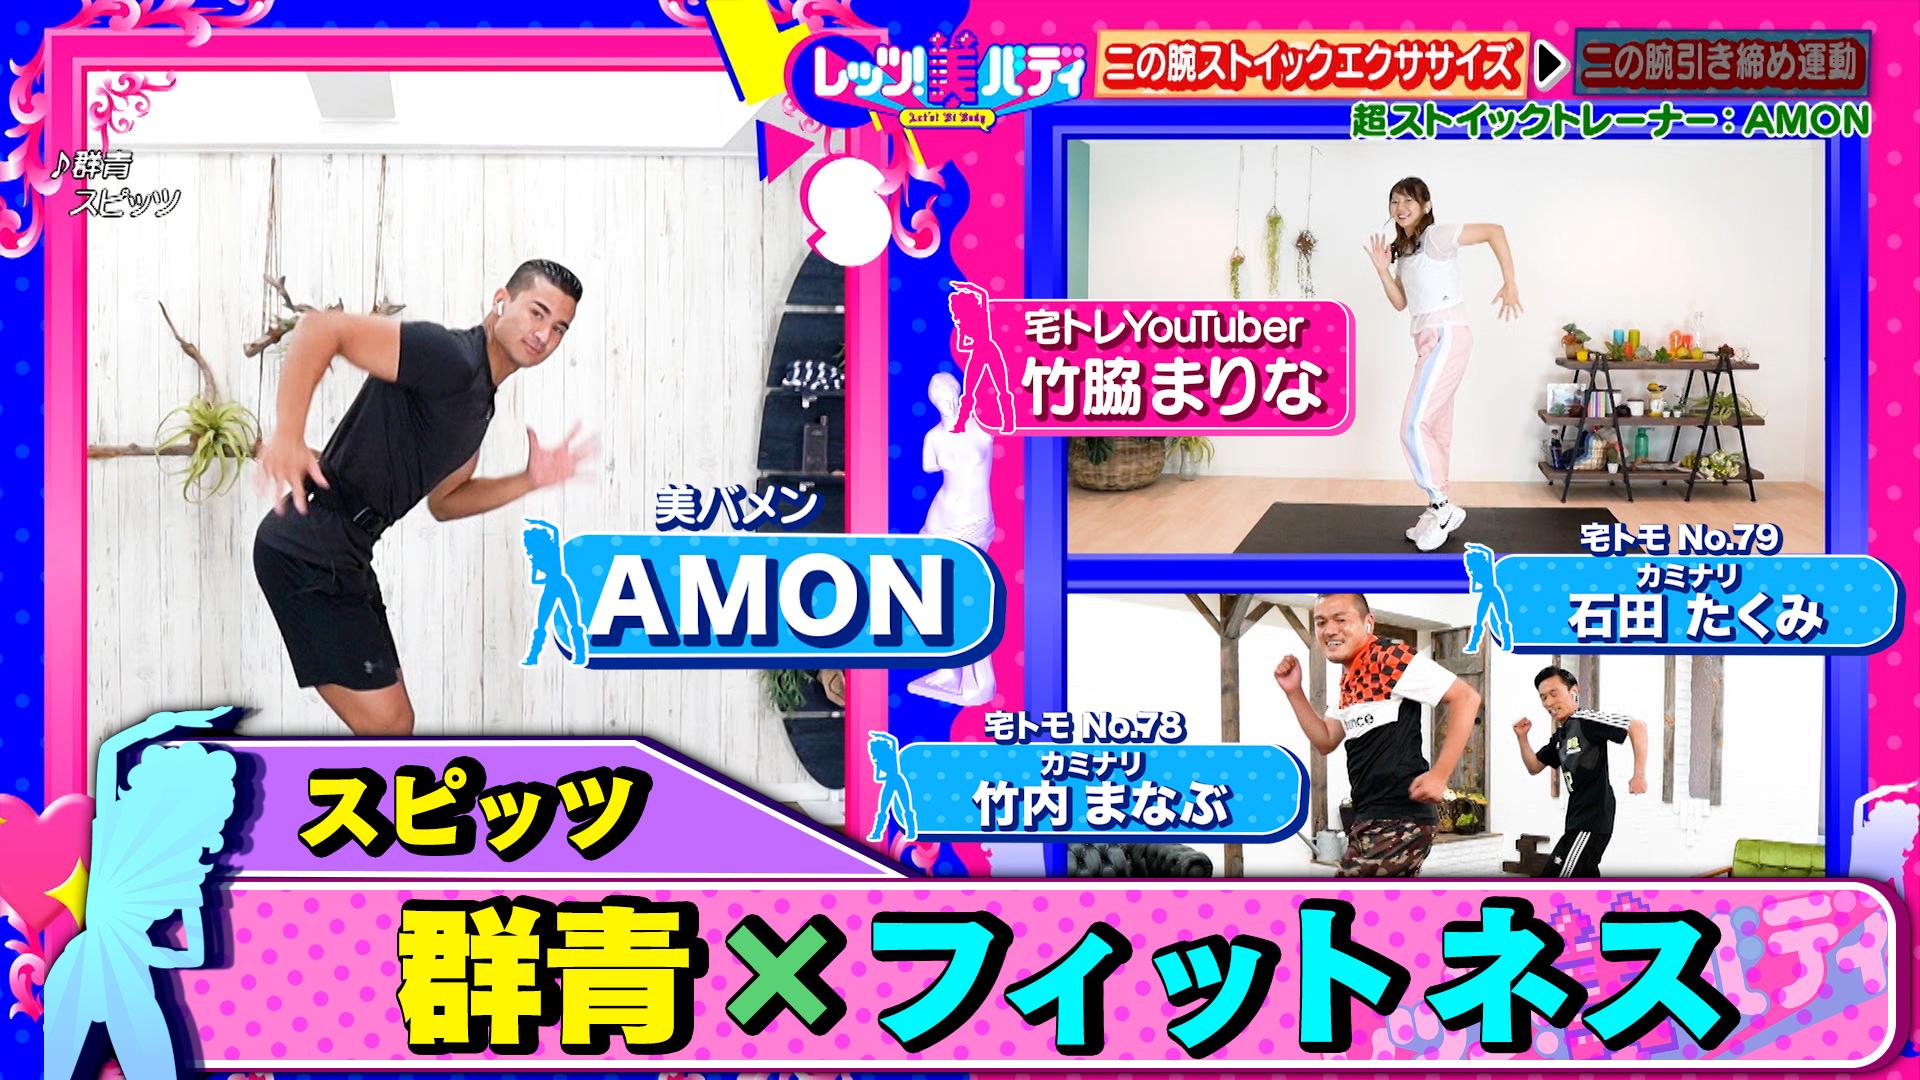 Let's!美バディ #196 竹脇まりな&カミナリ4